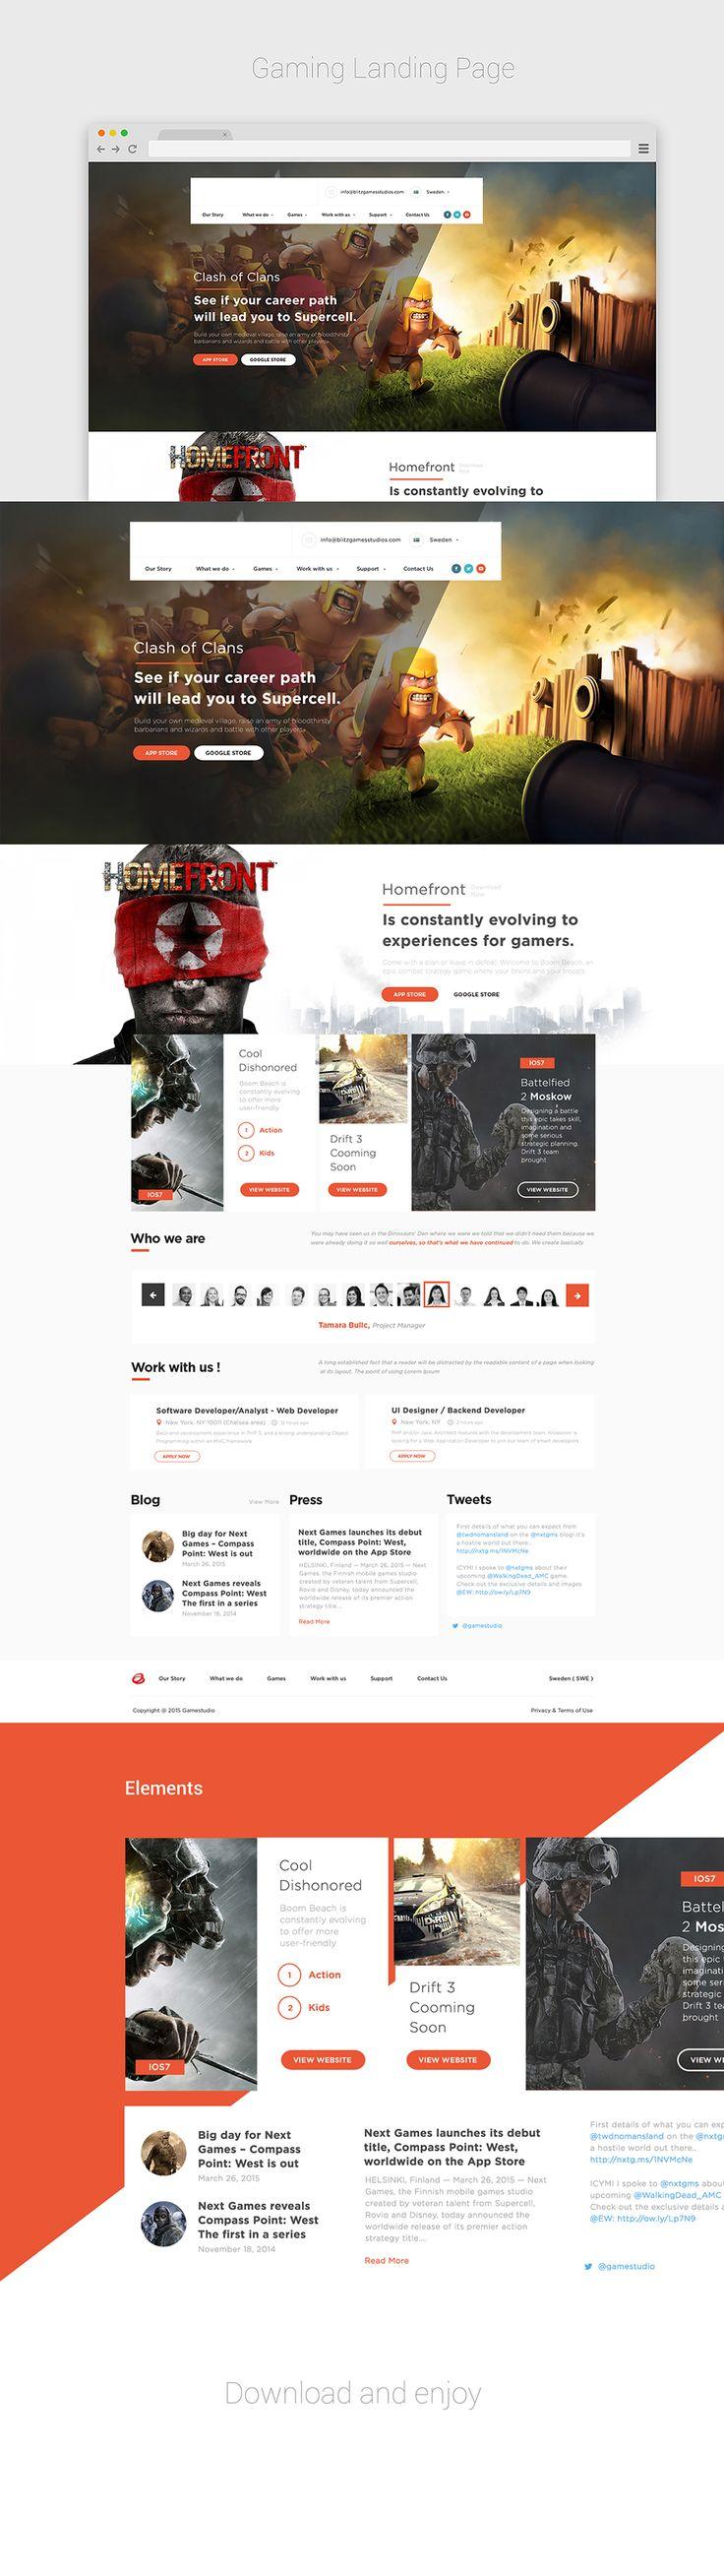 https://www.behance.net/gallery/28570275/Gaming-Landing-Page-Free-Download-